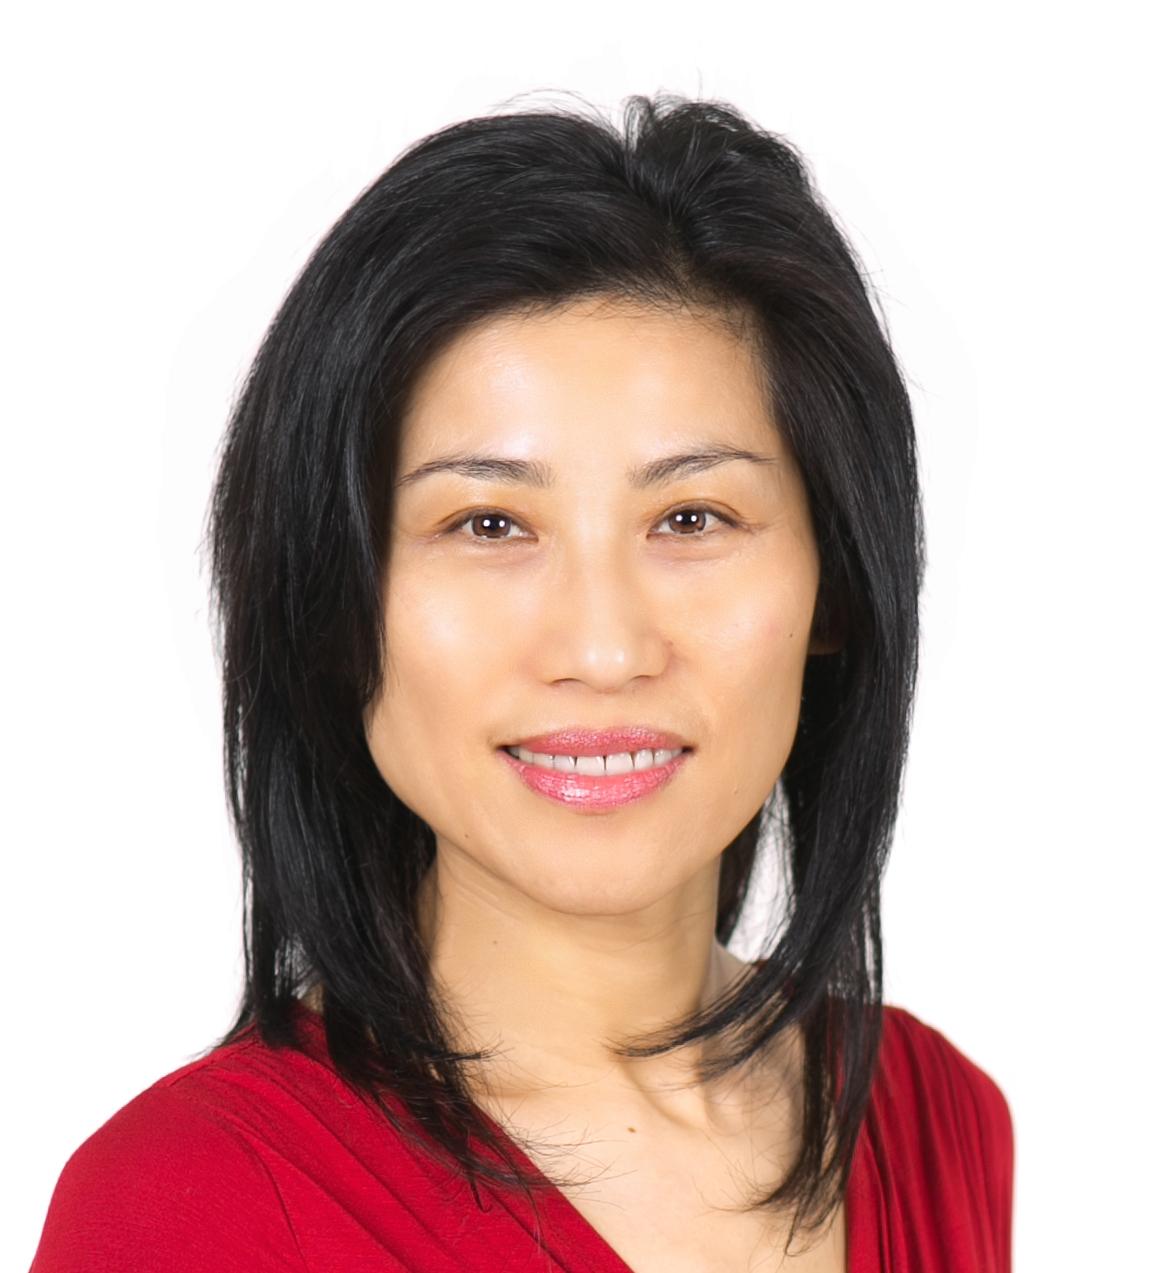 Nora Pan, Advancing Women Executives Leader